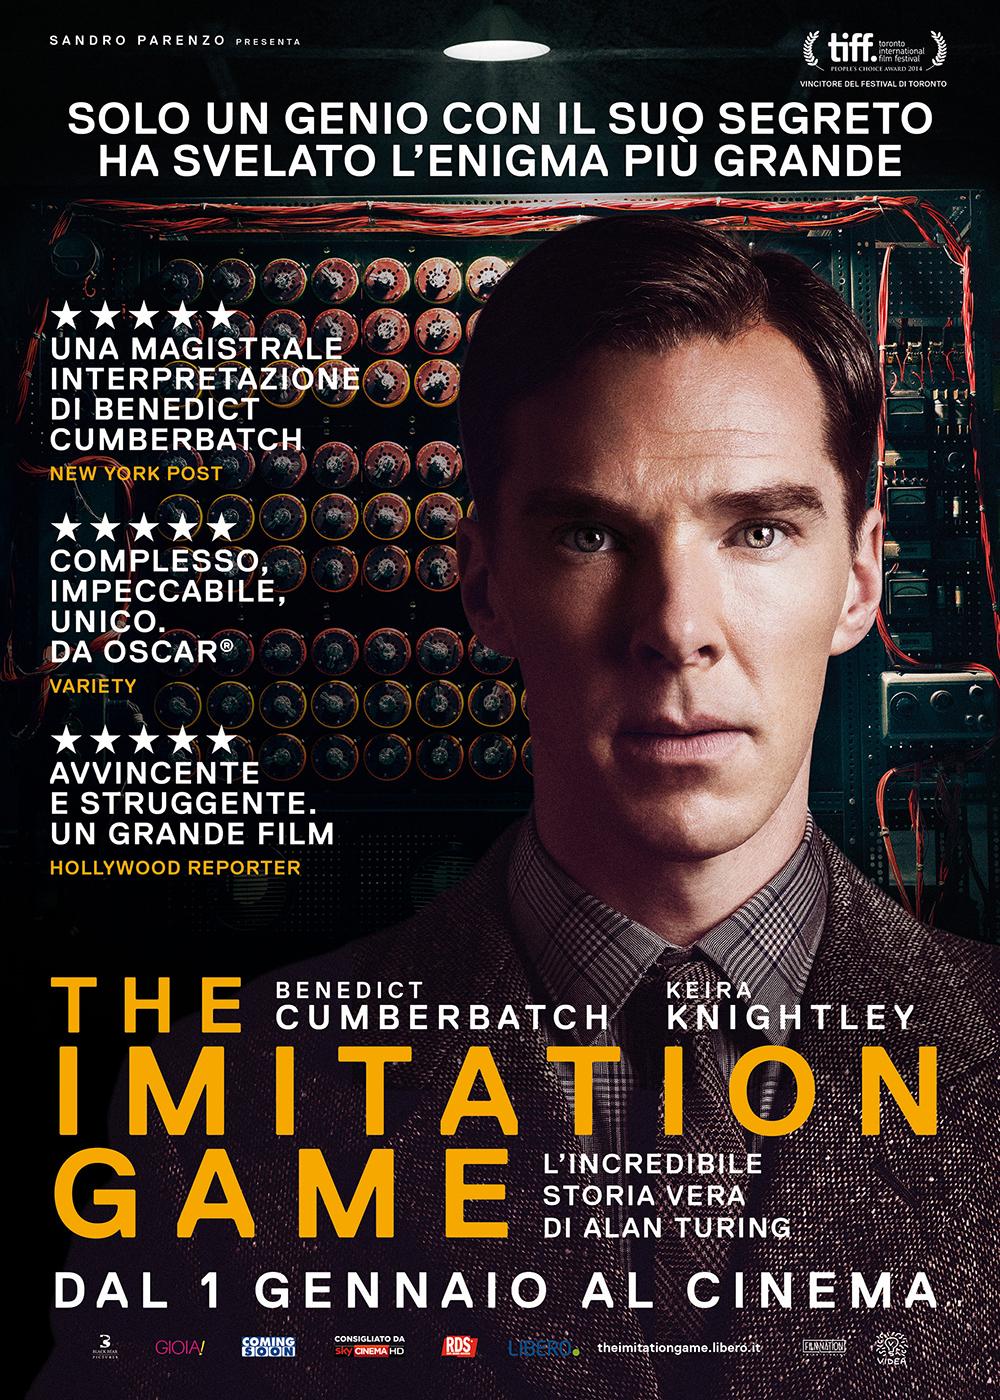 Imitation Game - film biografico sulla vita di Alan Turing - 2014